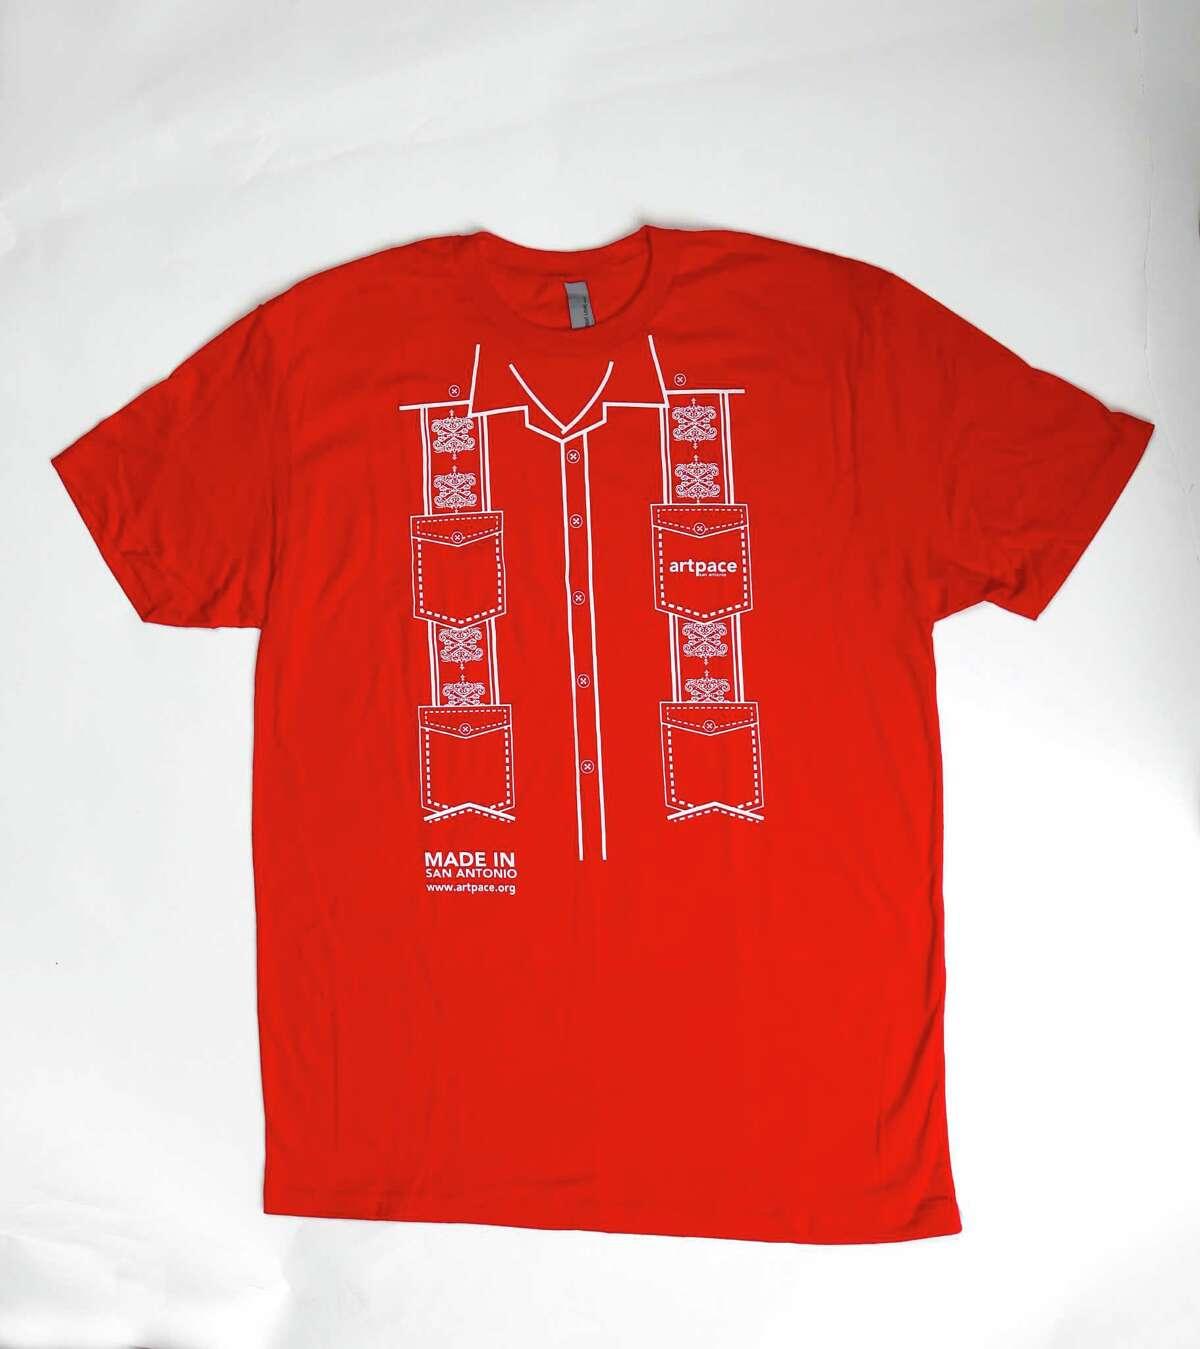 Guayabera T-shirt ($20 at Artpace, 445 N. Main Ave., 210-212-4900, artpace.org). The great ?